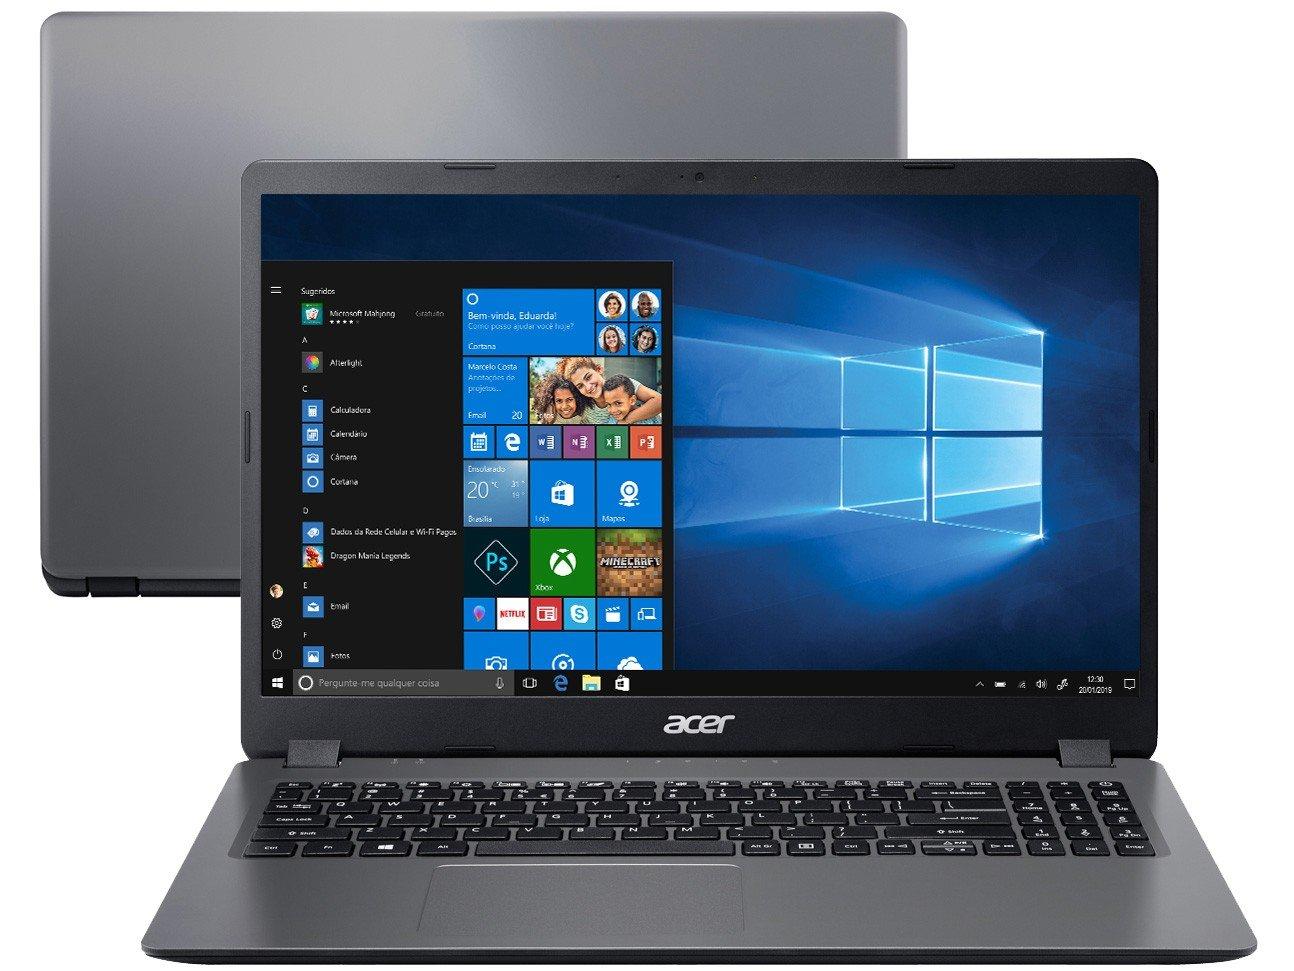 "Notebook Acer Aspire 3 A315-56-3090 Intel Core i3 - 8GB 256GB SSD 15,6"" Windows 10 - Bivolt"